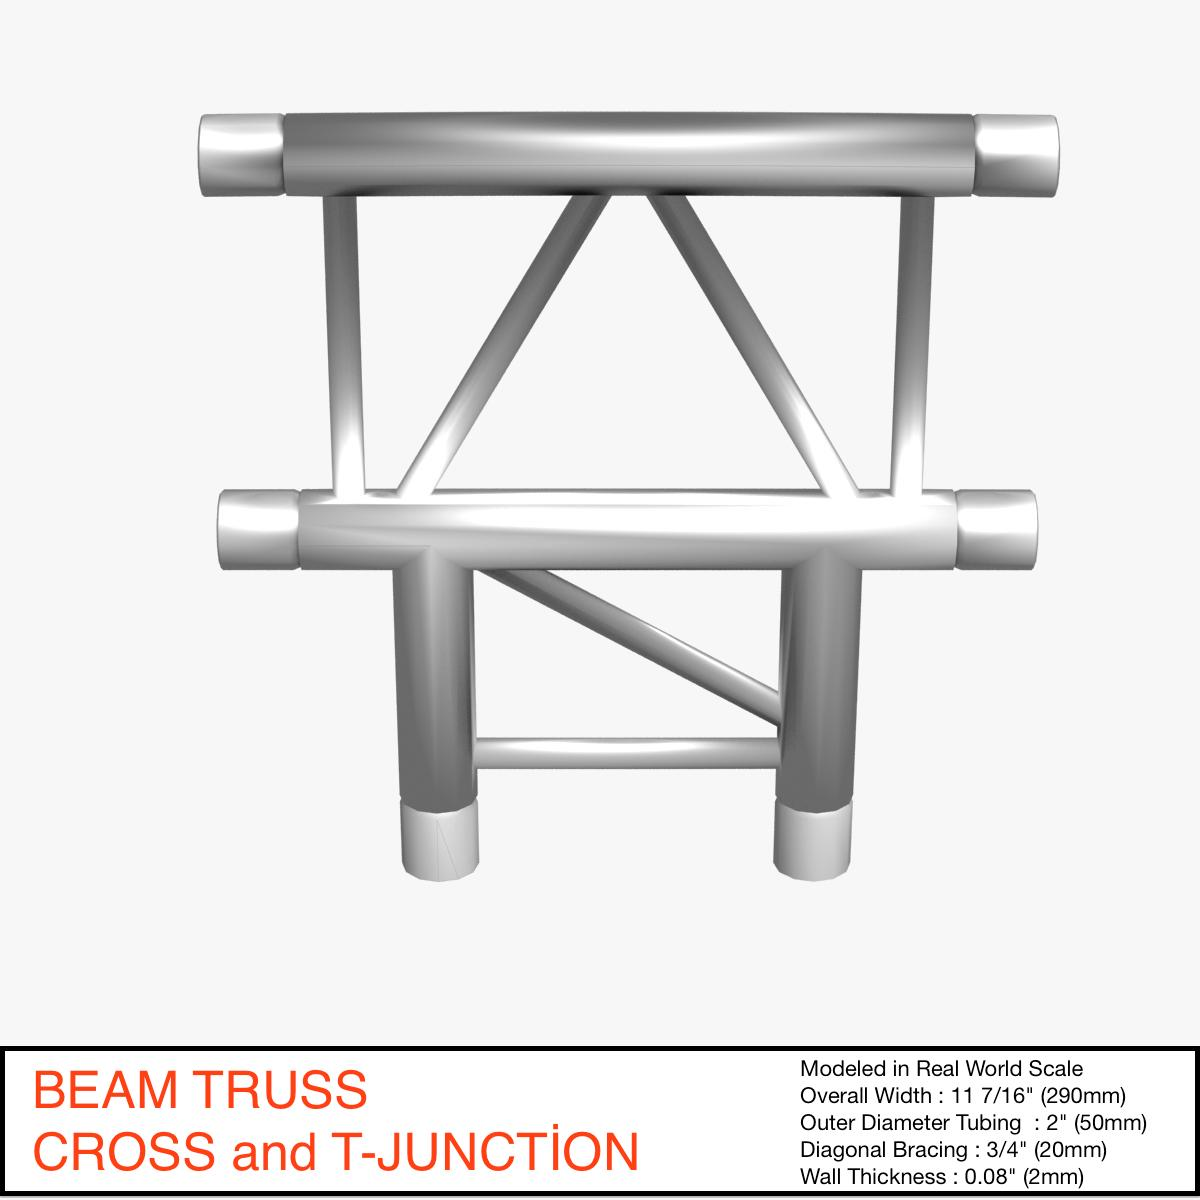 Beam Truss Cross and T Junction 134 3d model 3ds max dxf fbx c4d  obj 268776